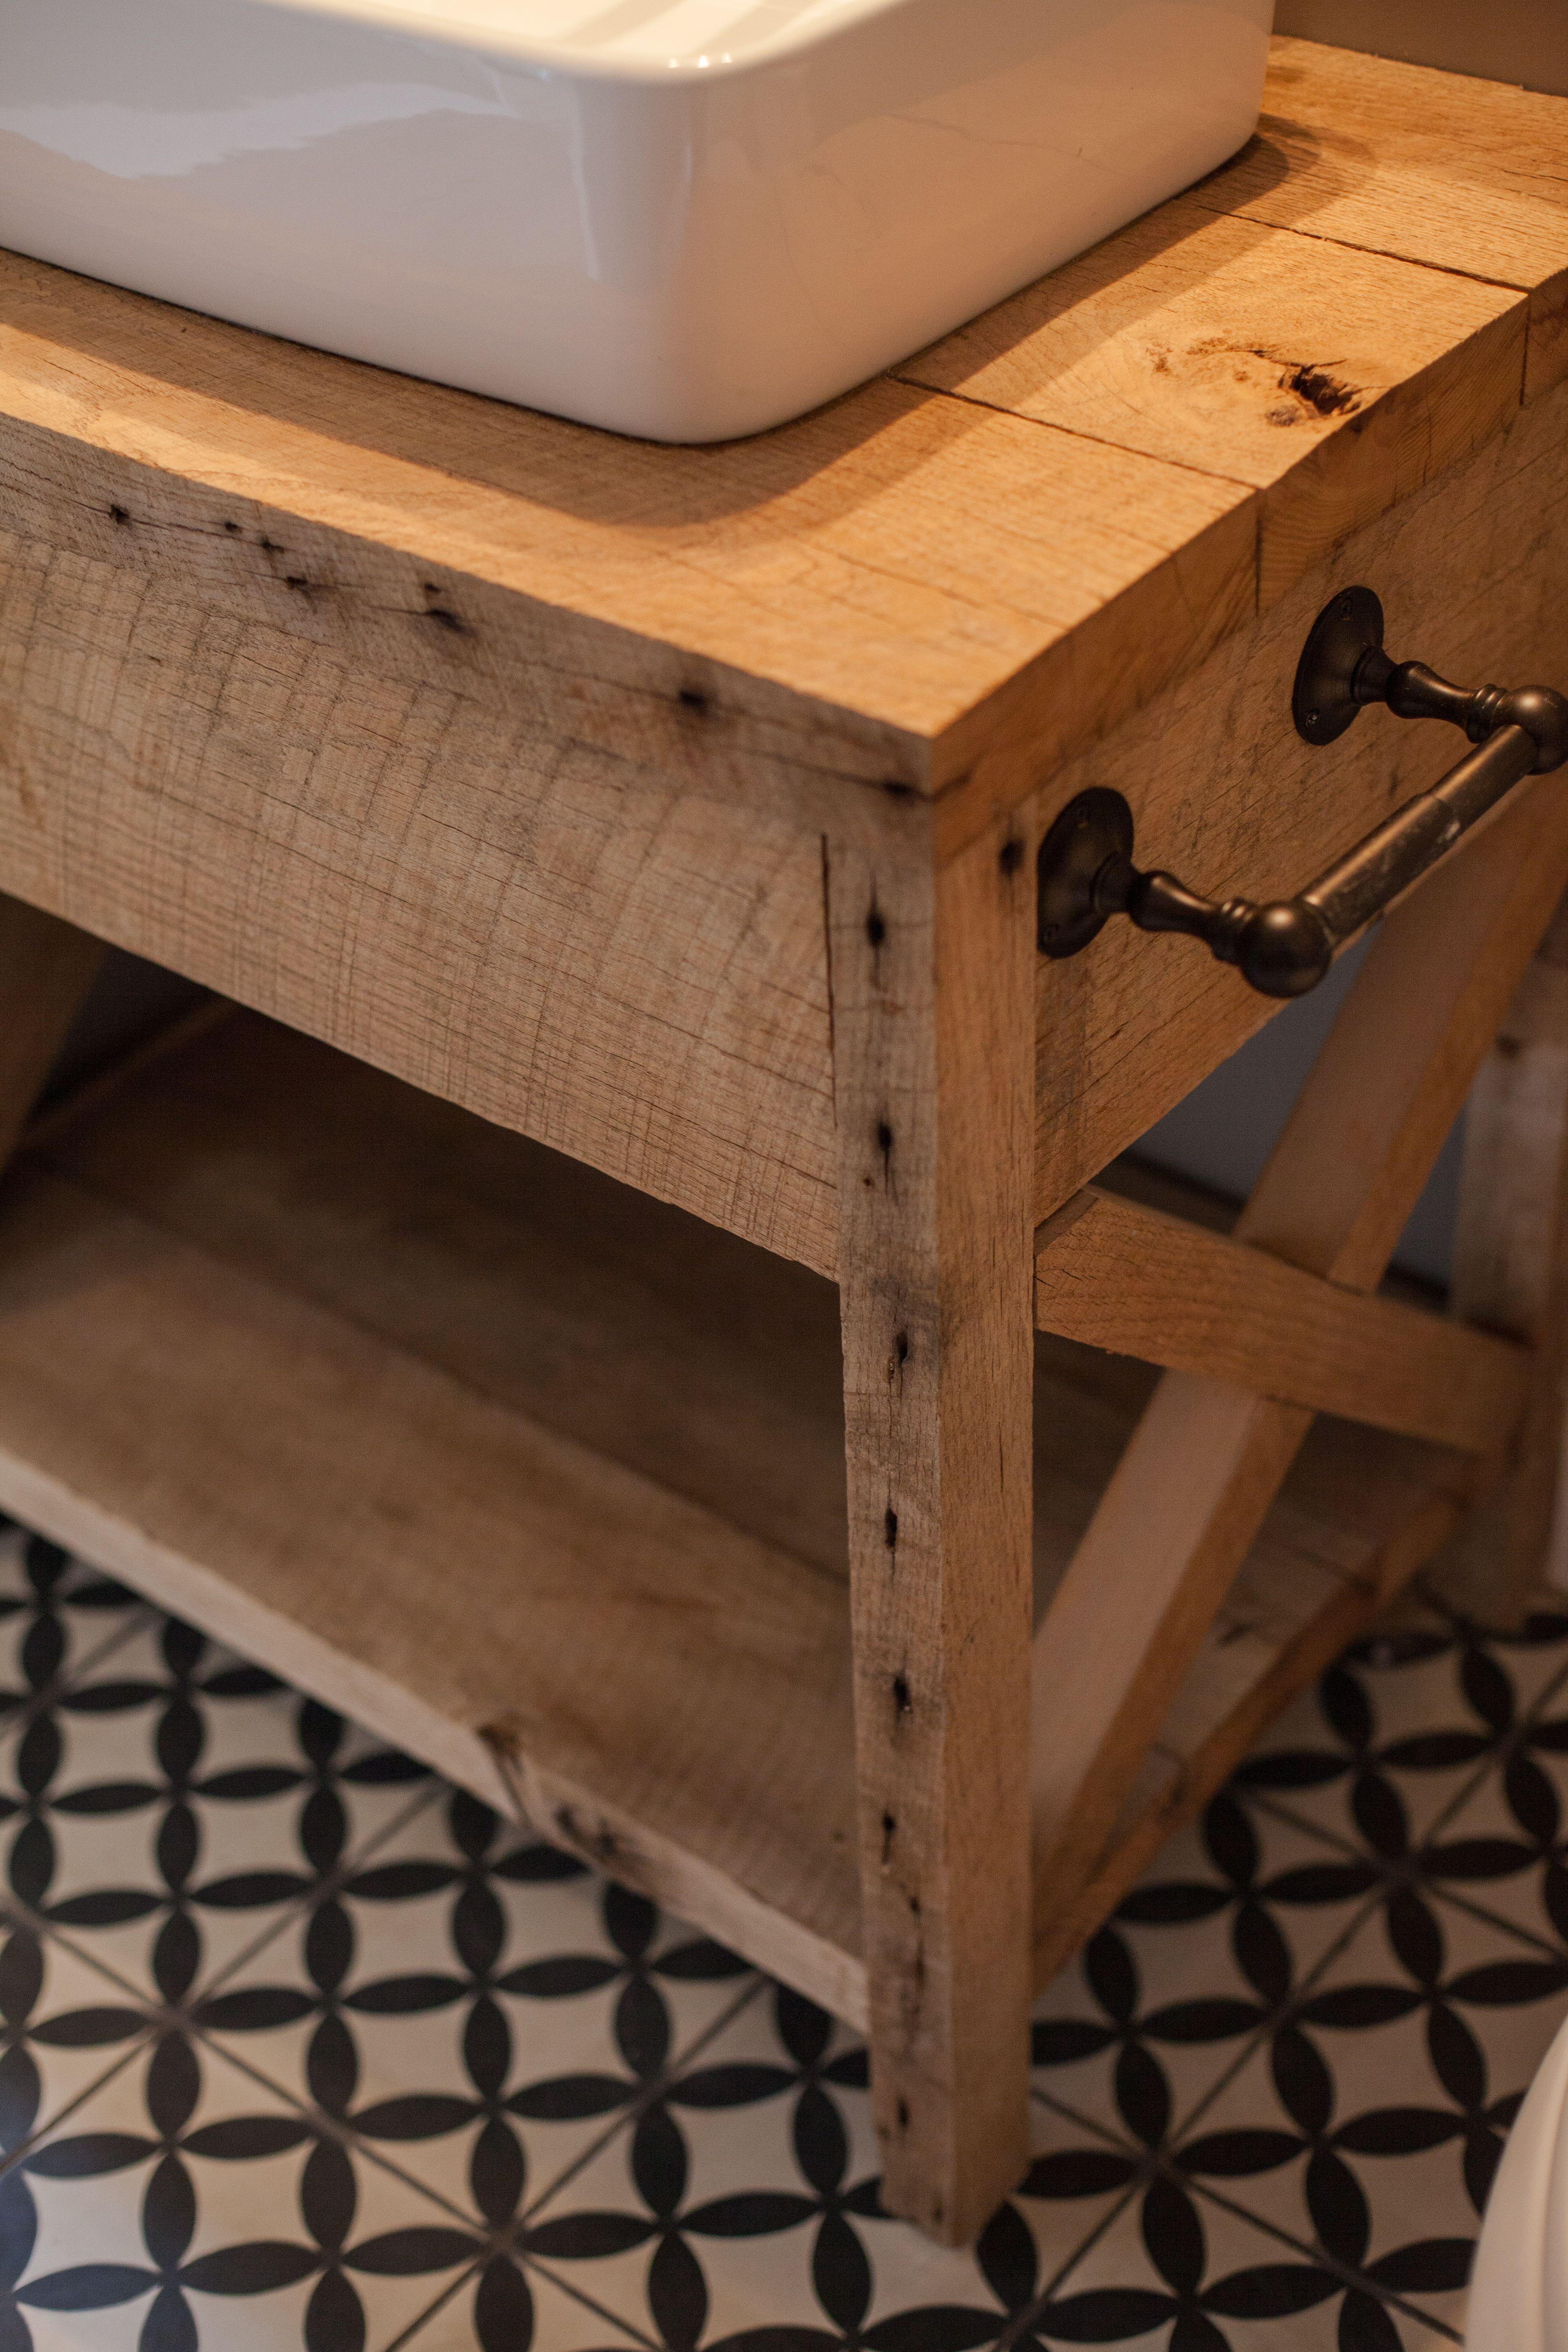 Custom Barn Wood Bath Vanity With Cement Tile Floor By